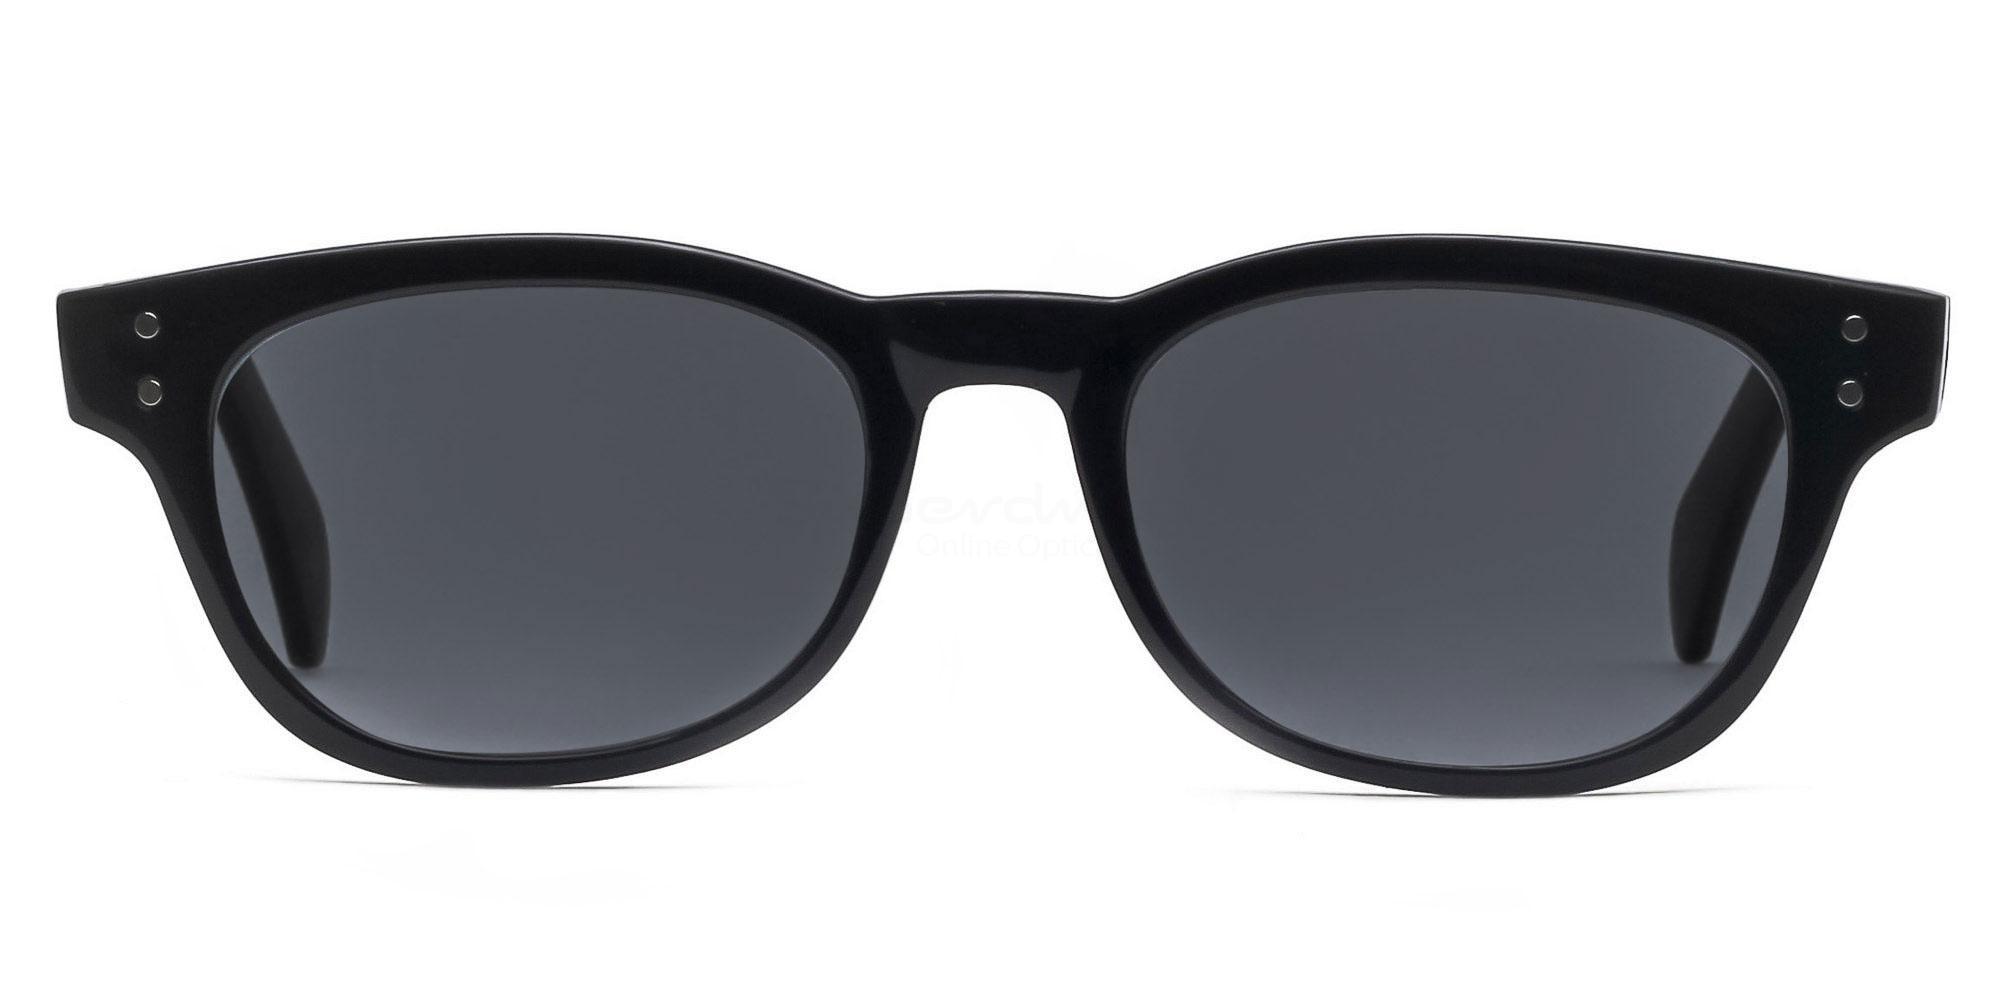 C01 Dark Grey P2249 Shiny Black (Sunglasses) , Indium